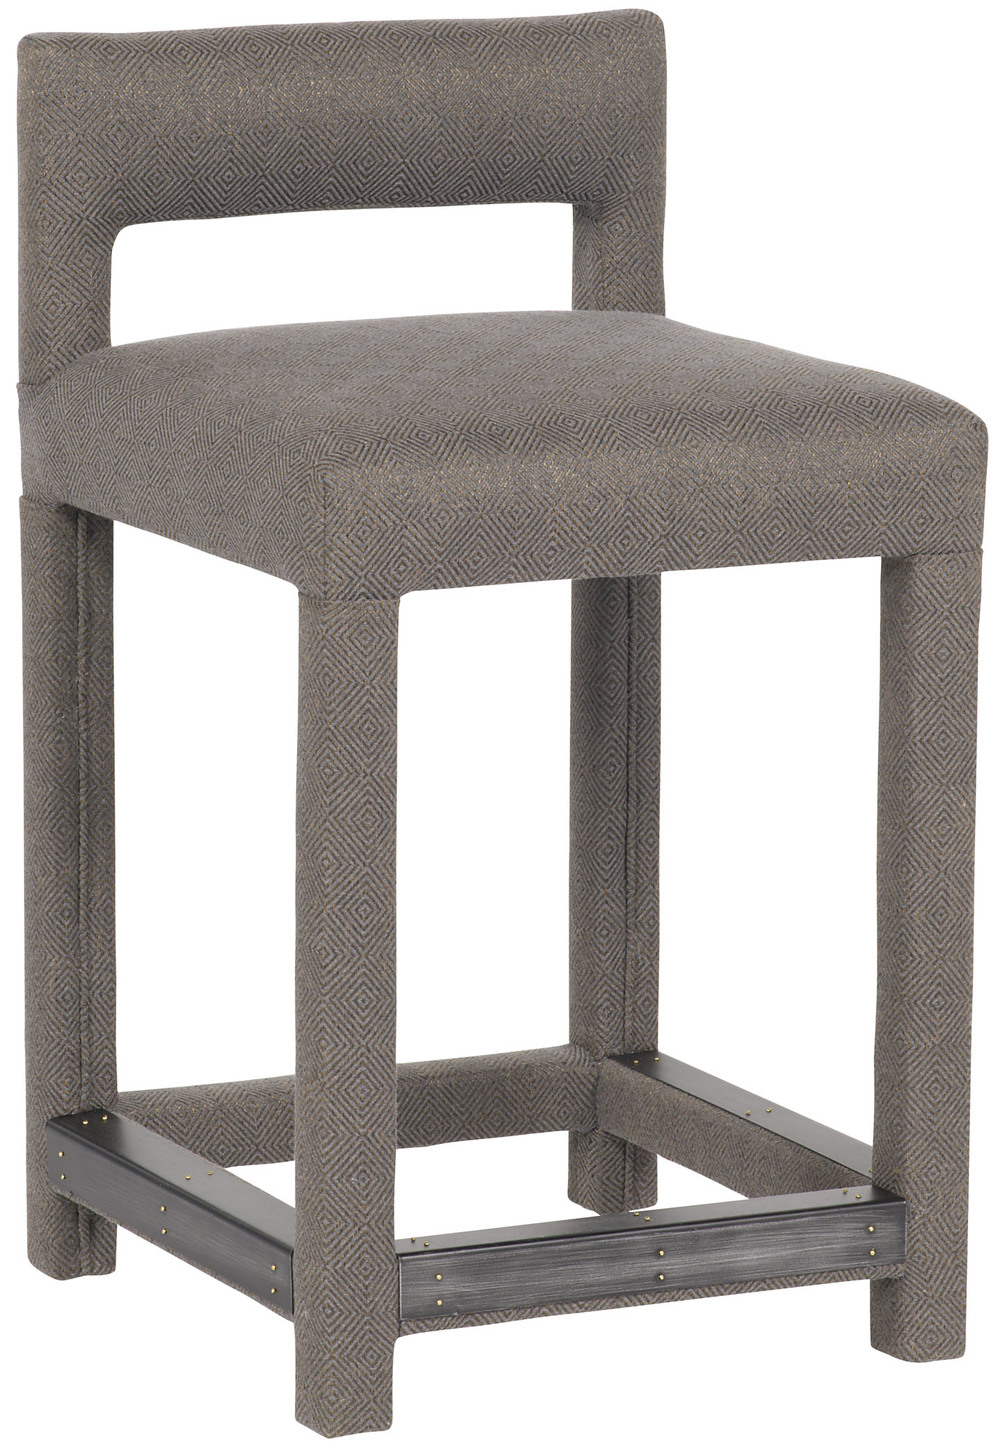 Vanguard Furniture - Utica Counter Stool